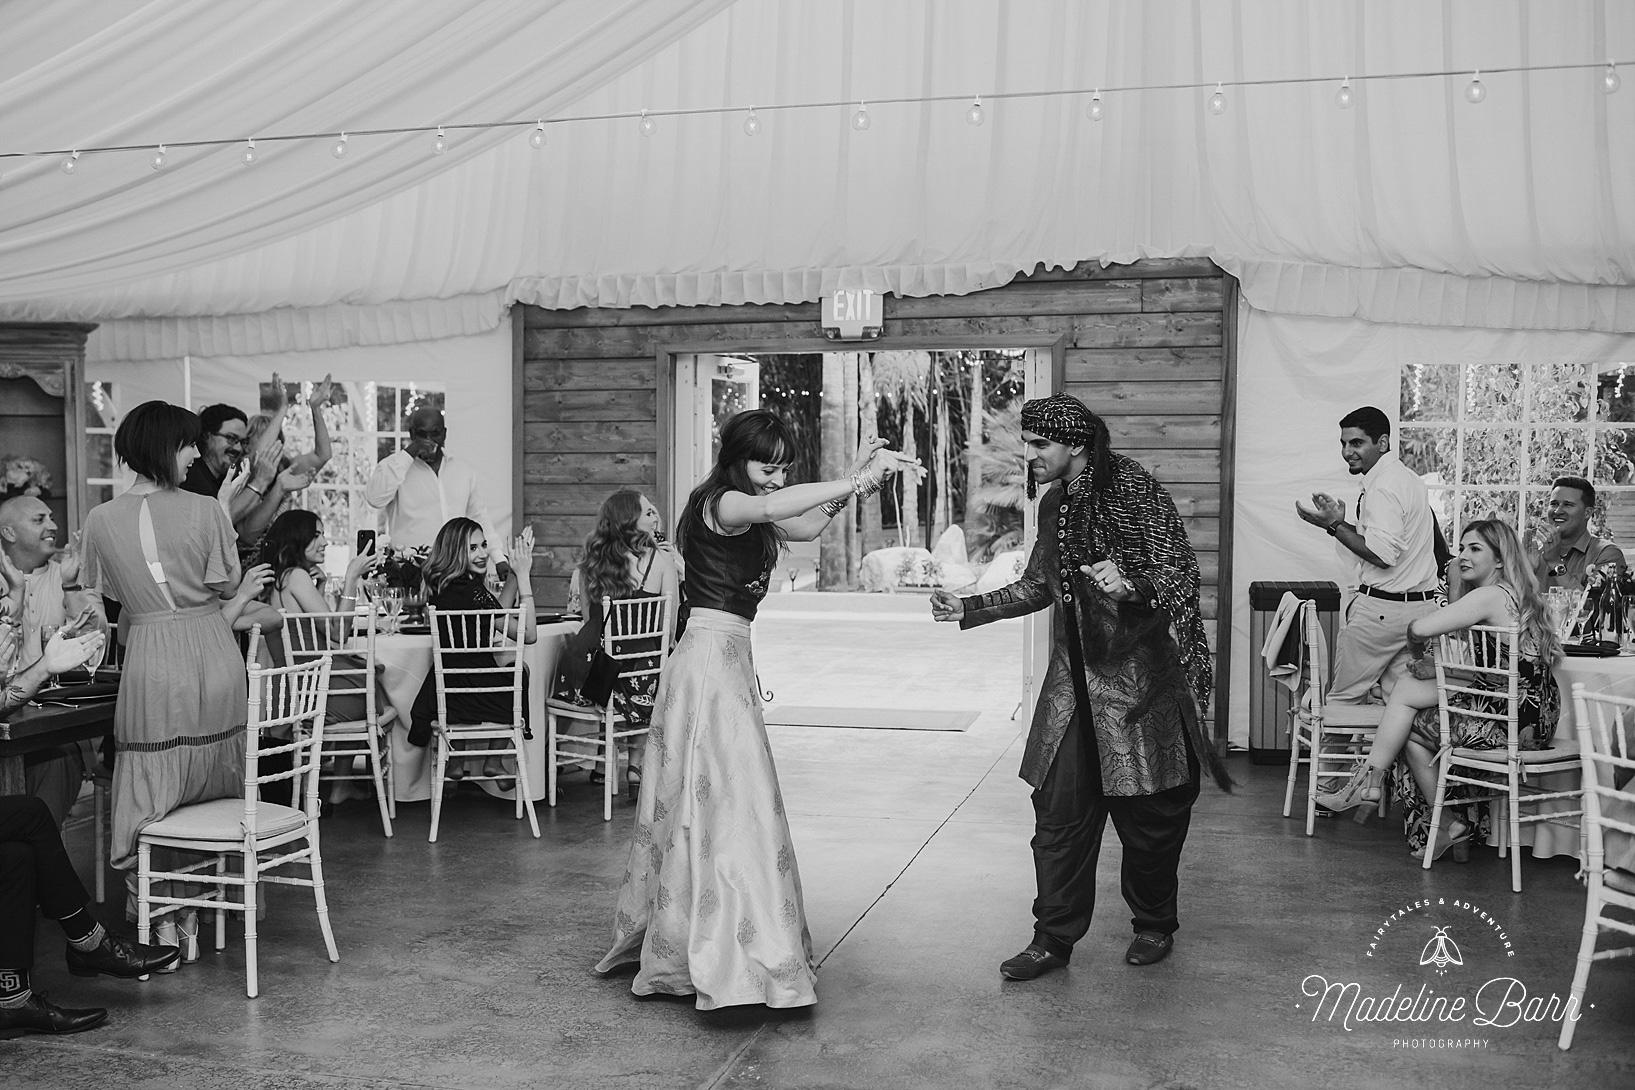 SanDiego_Multicultural_Elopement_Wedding0048s.jpg